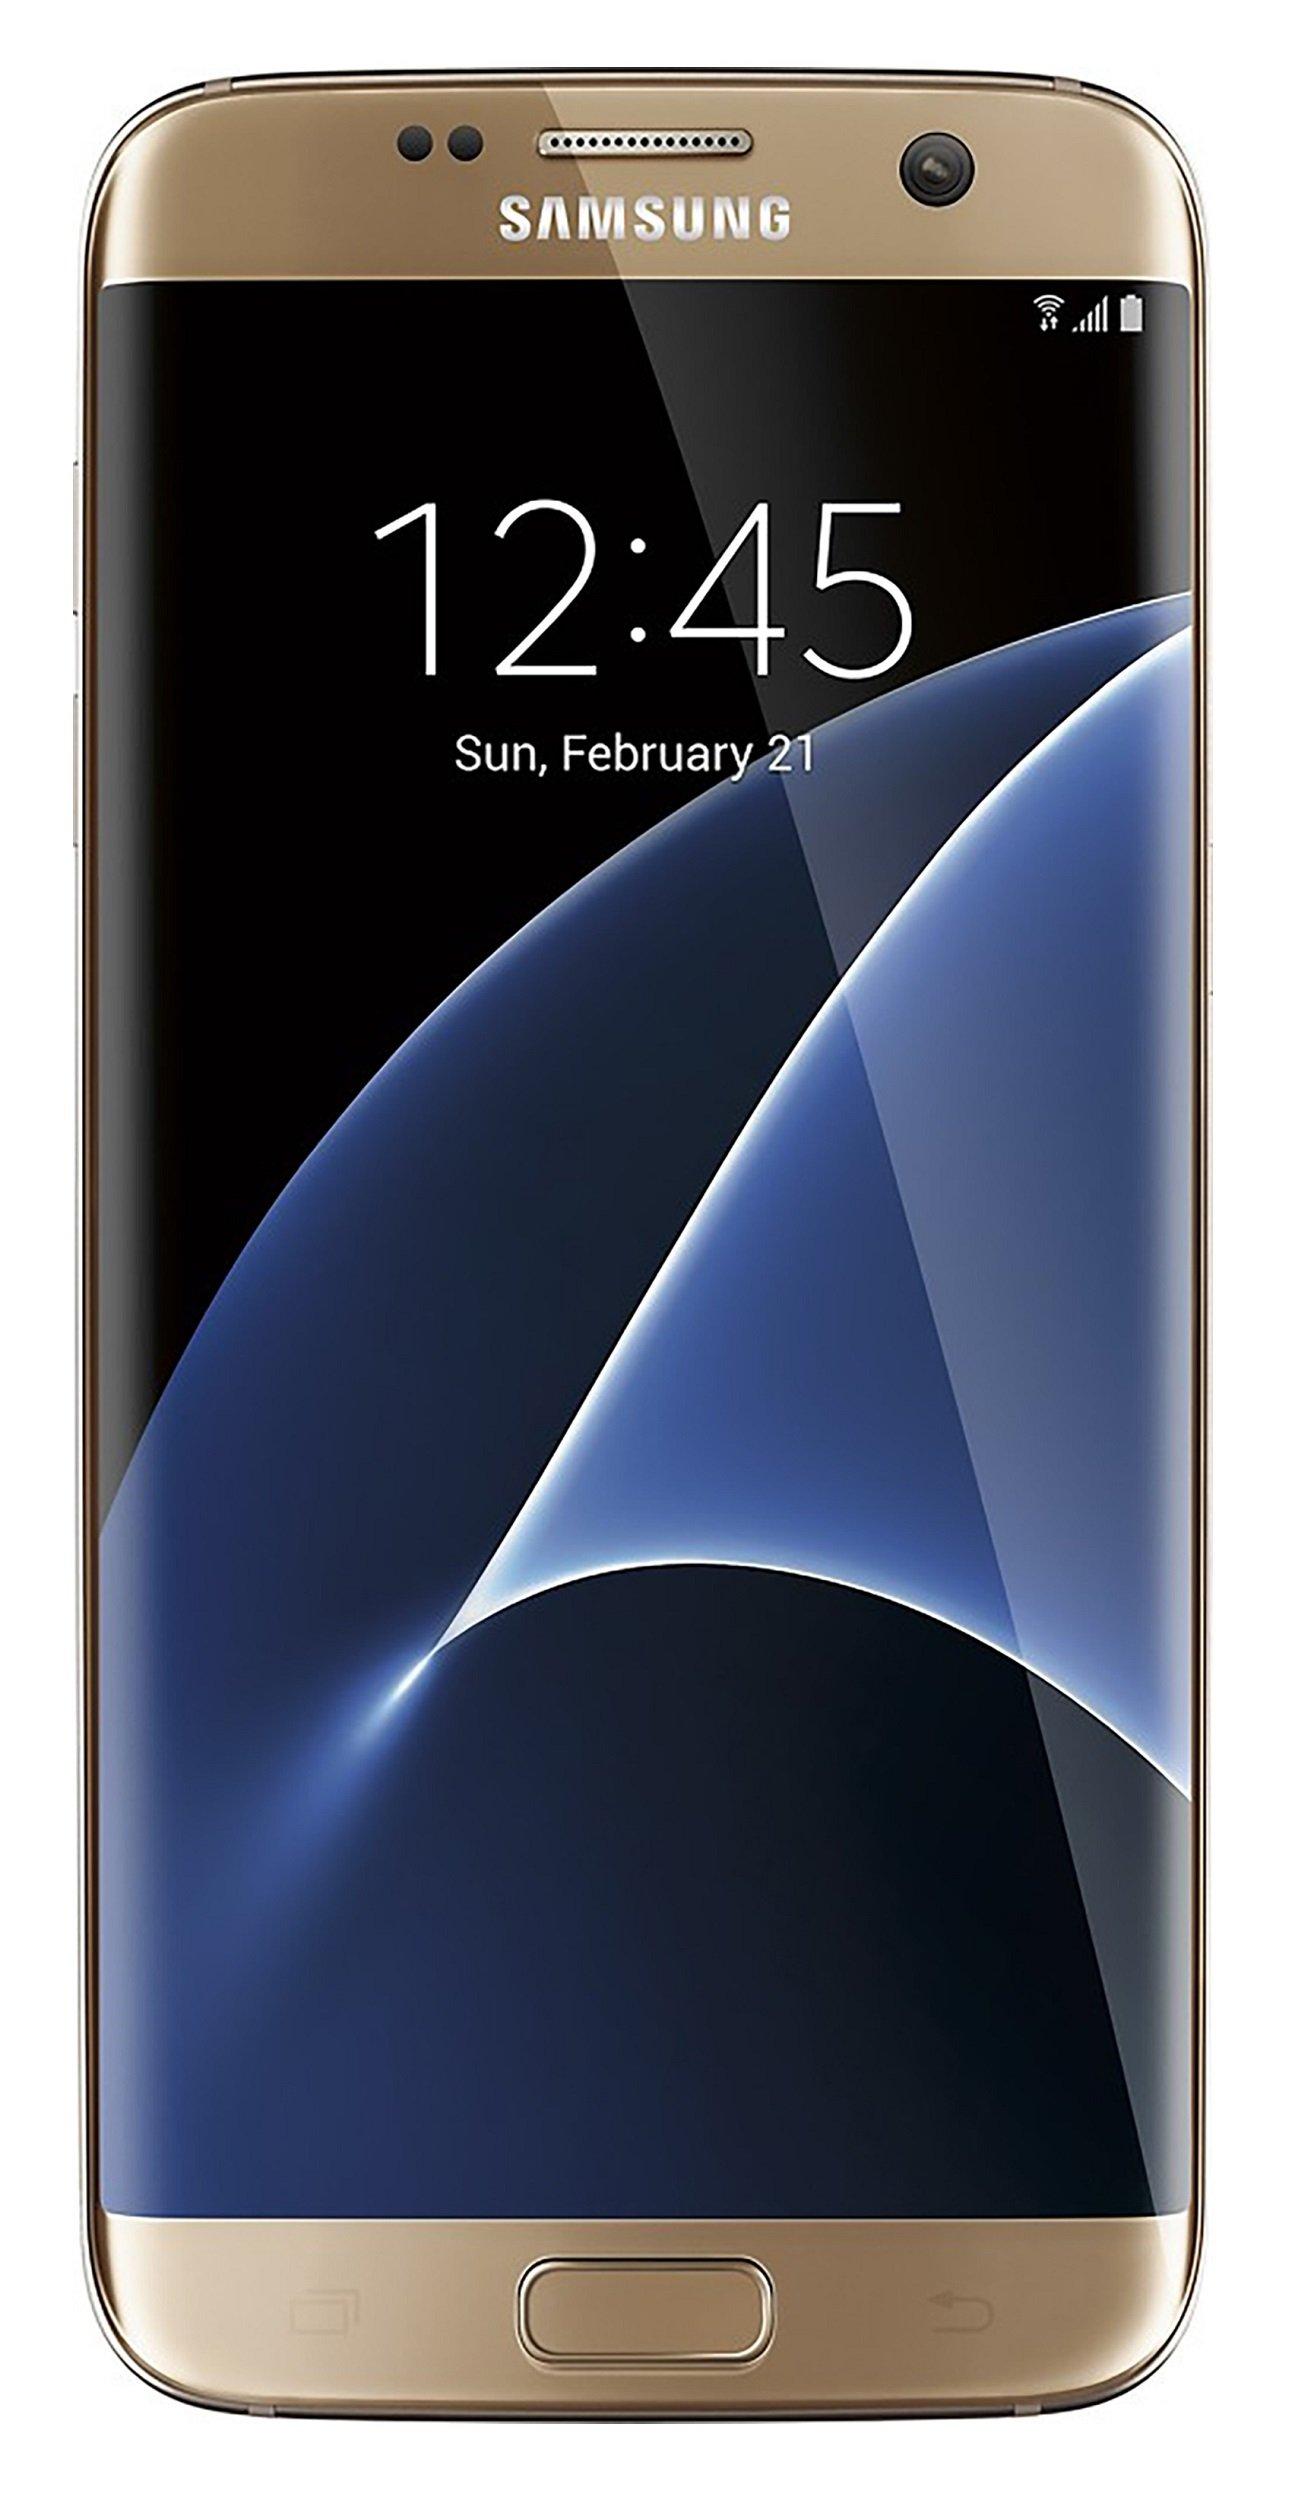 Samsung Galaxy S7 Edge Verizon Wireless CDMA 4G LTE Smartphone w/ 12MP Camera and Infinity Screen - Gold